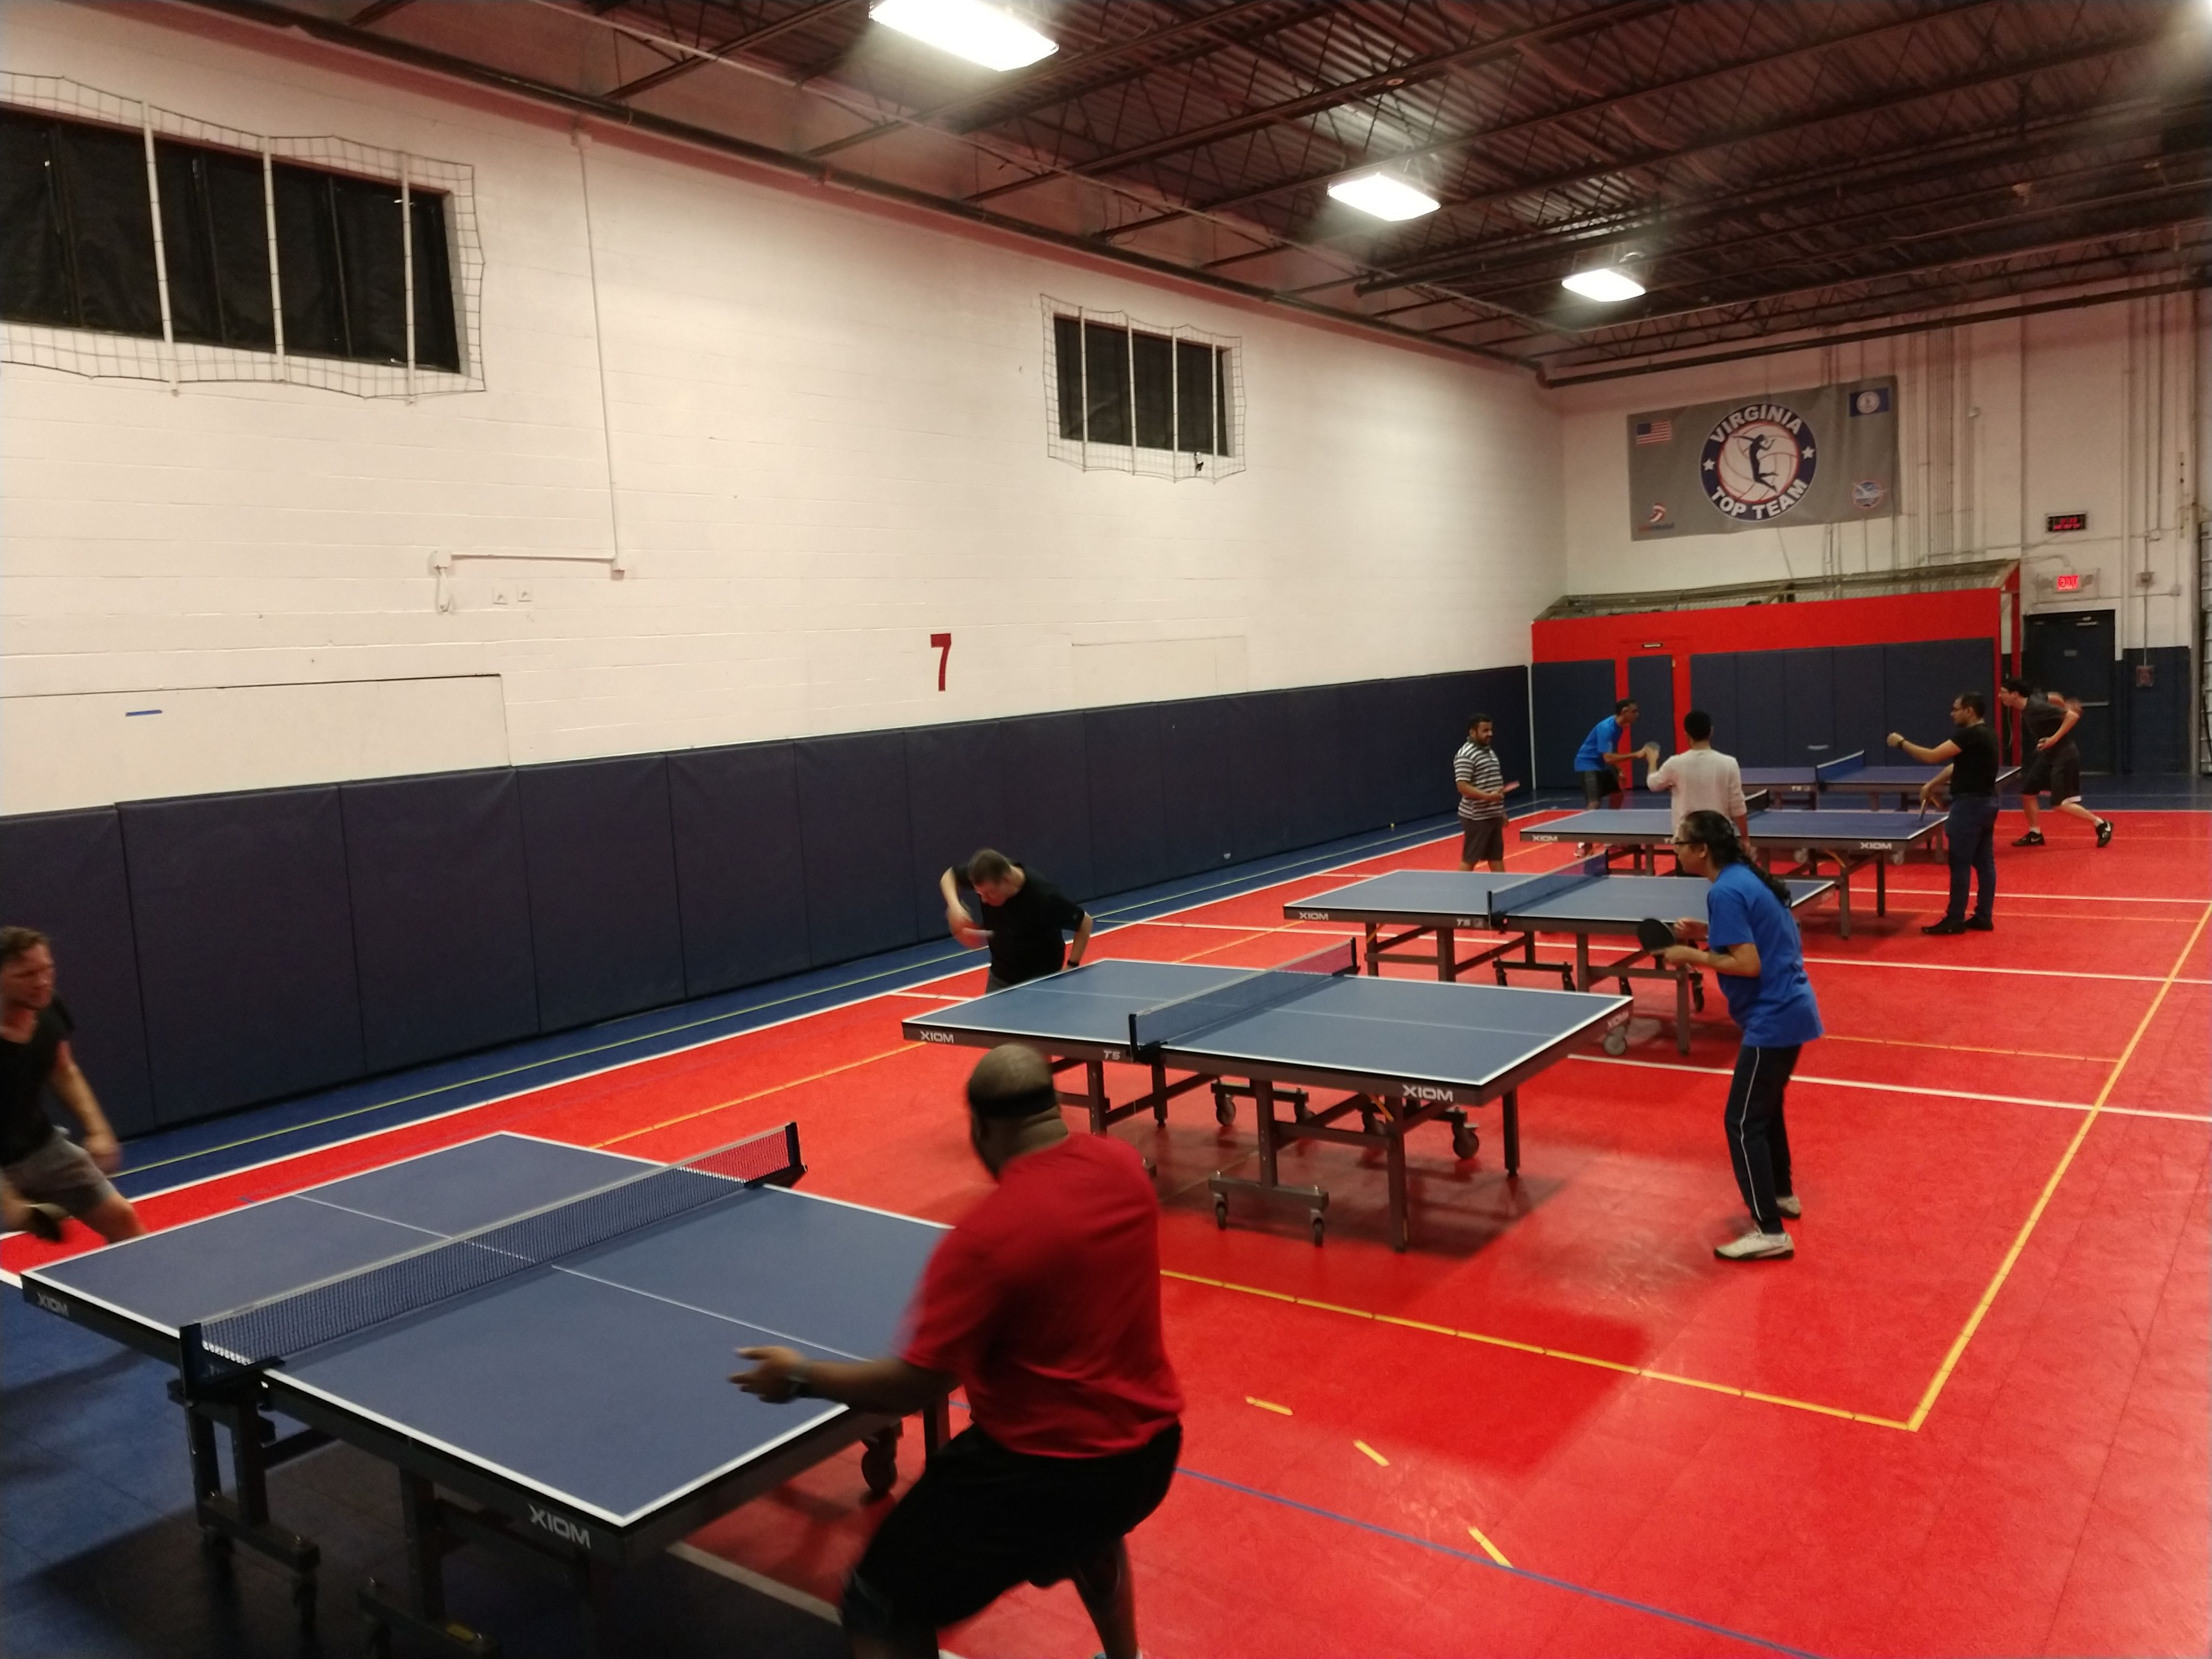 Table Tennis(Ping Pong) Sterling-Herndon-Ashburn